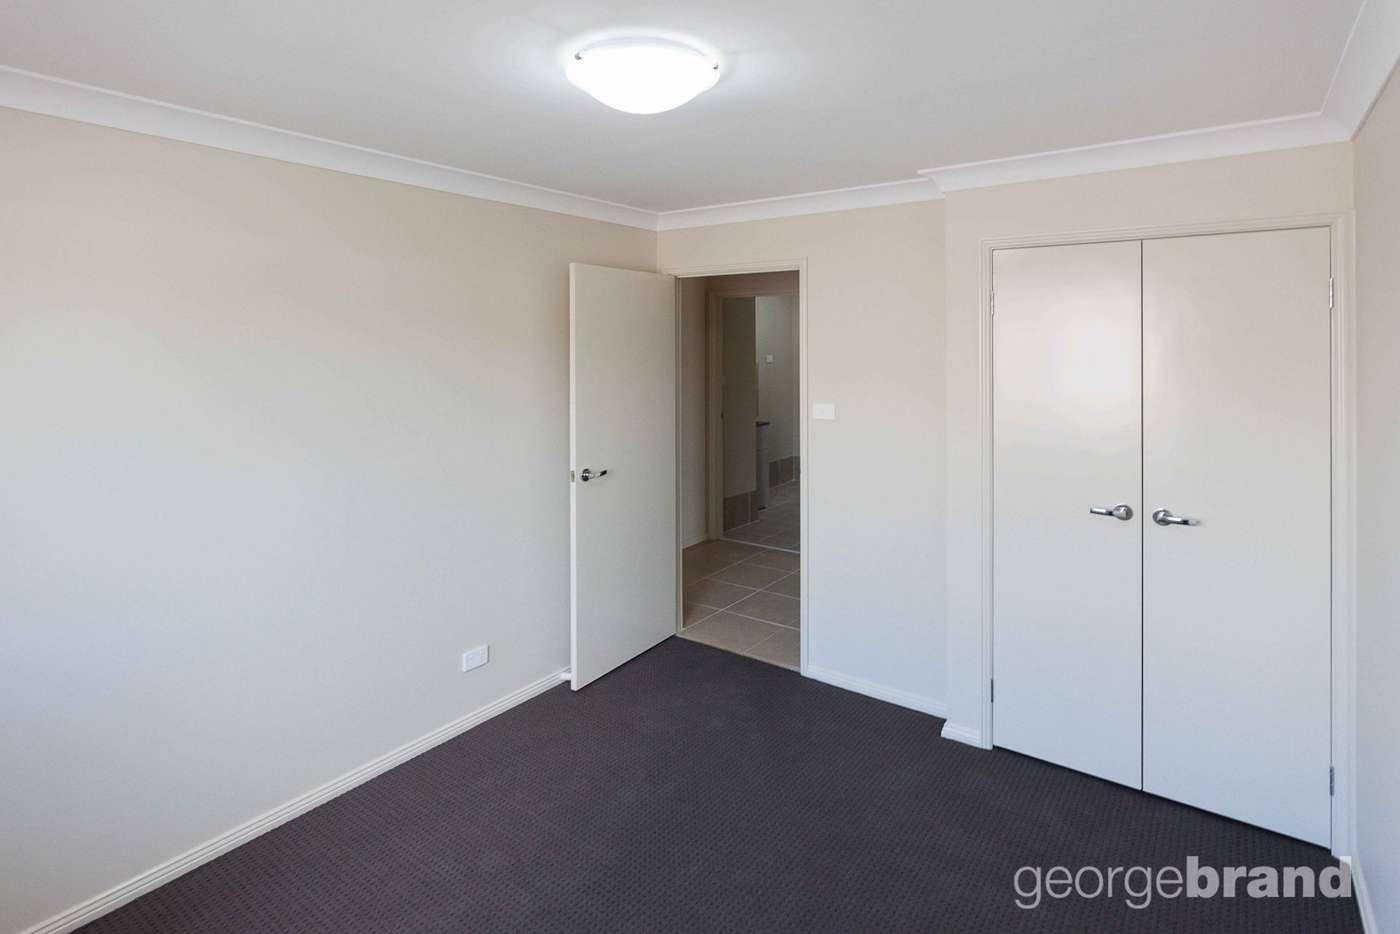 Sixth view of Homely house listing, 3 Sandridge Street, Thornton NSW 2322